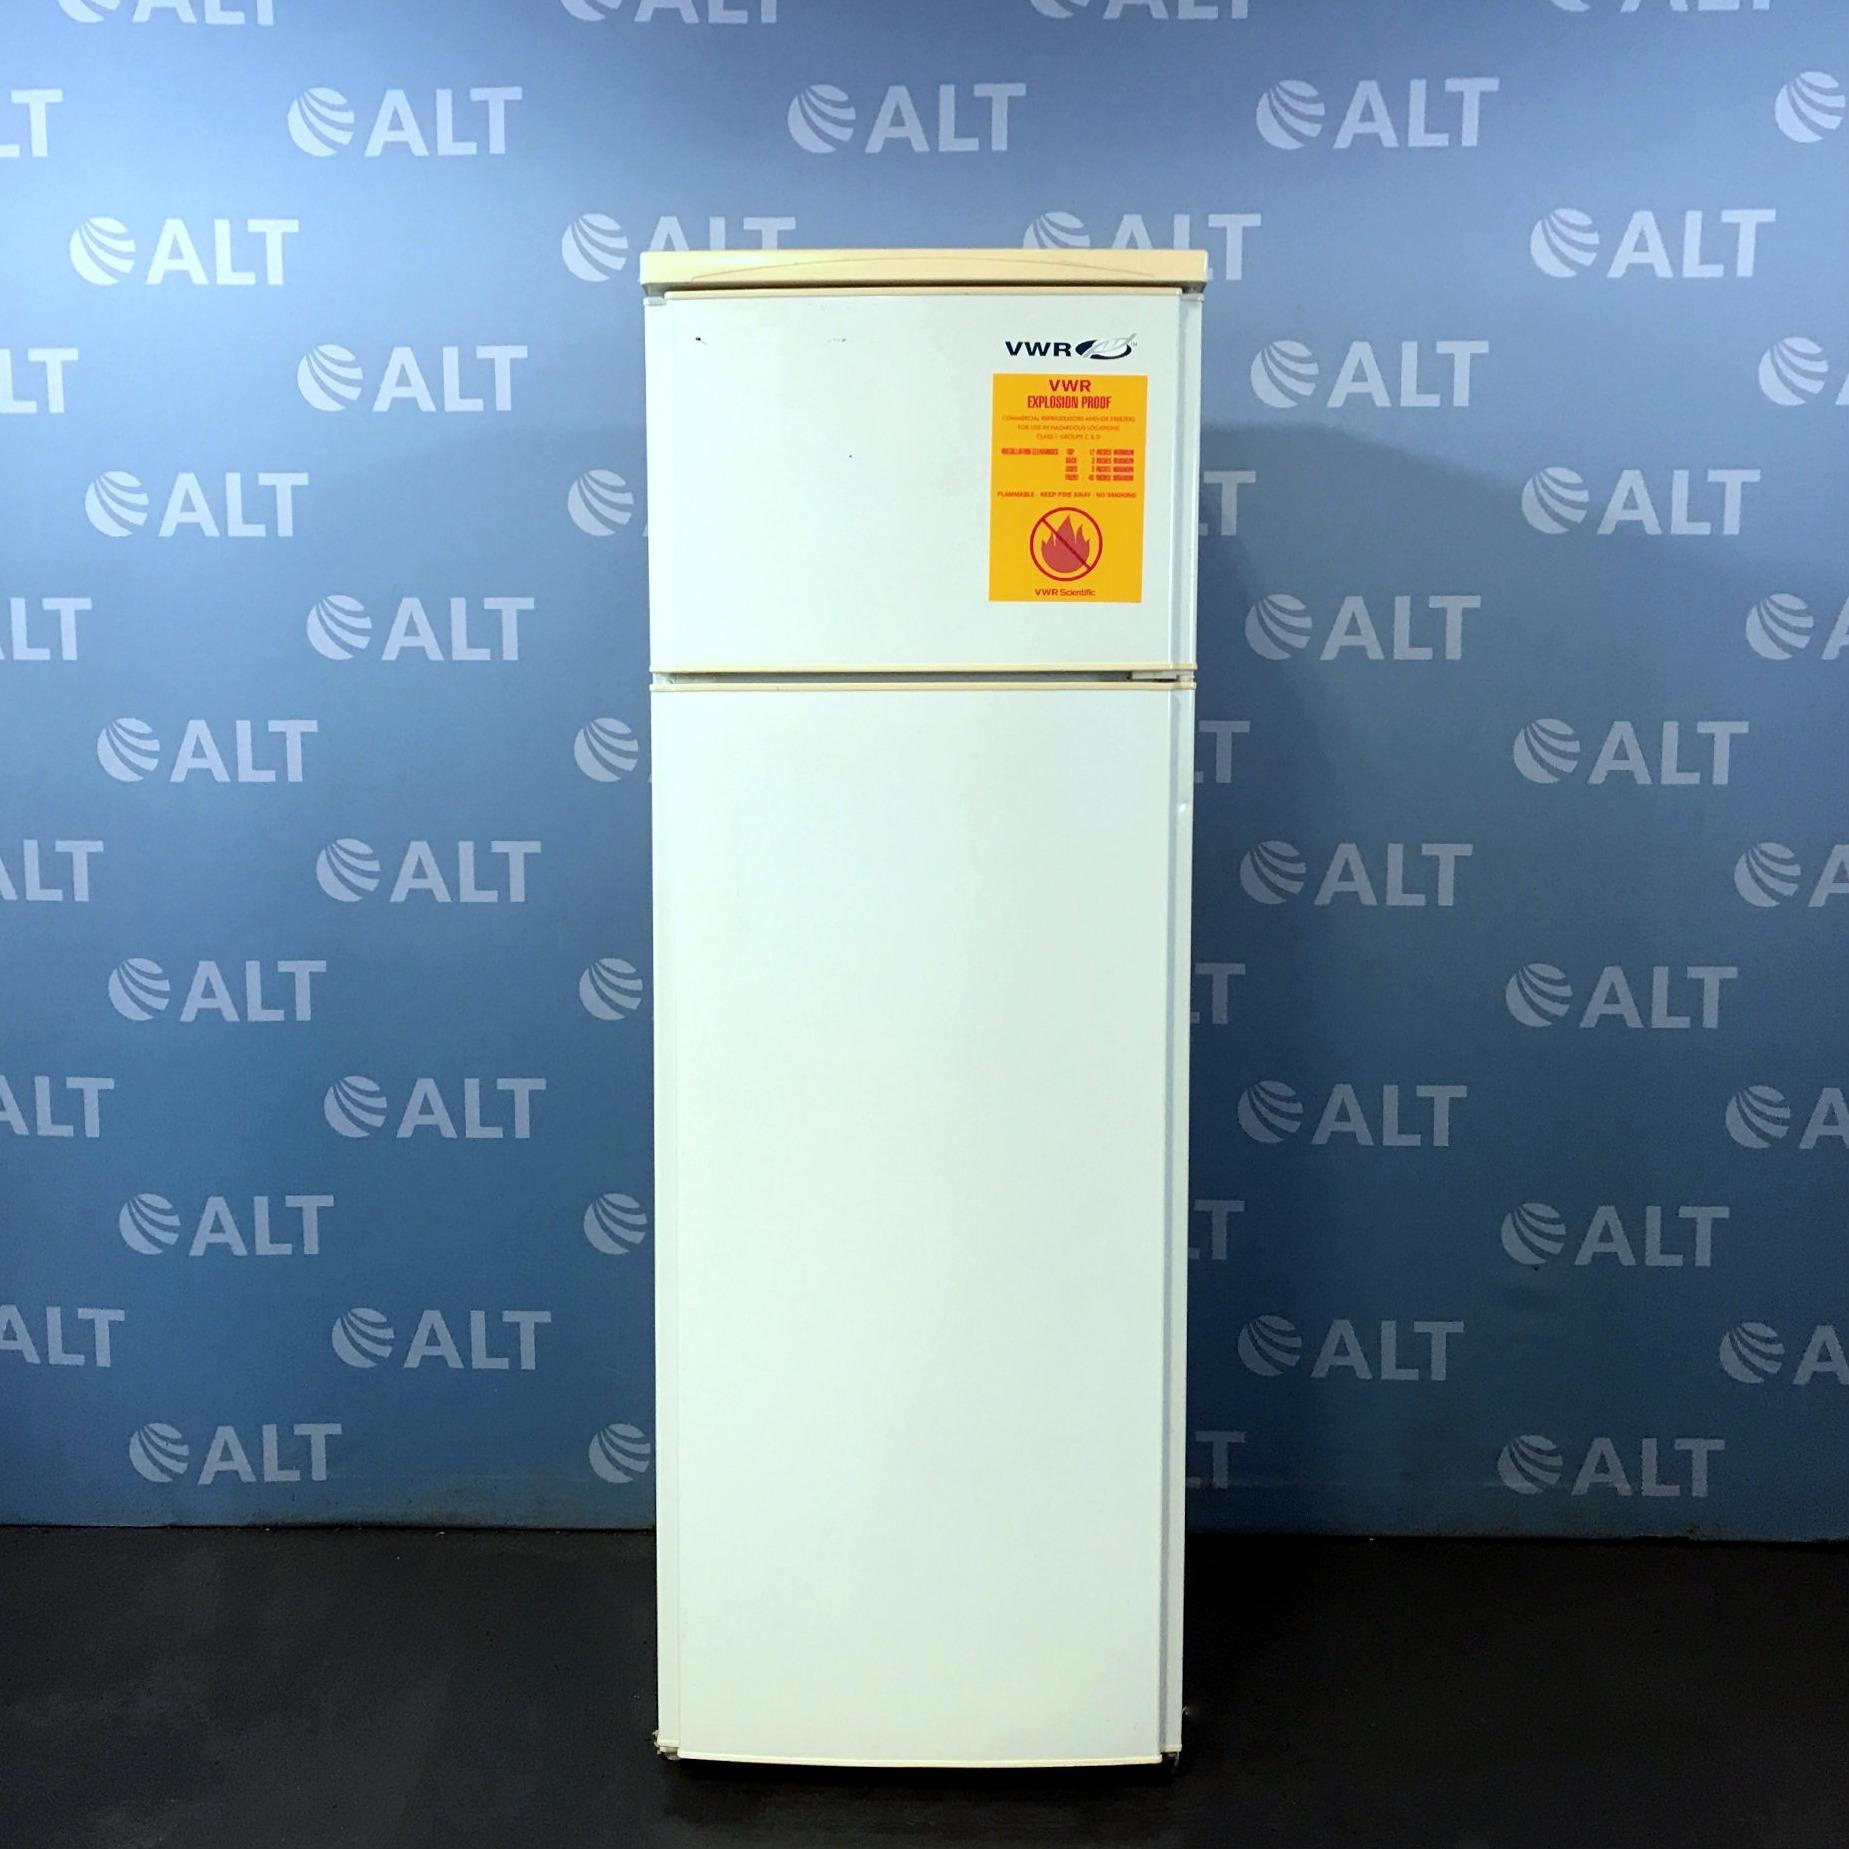 R411XA16 Explosion-Proof Refrigerator / Freezer Name